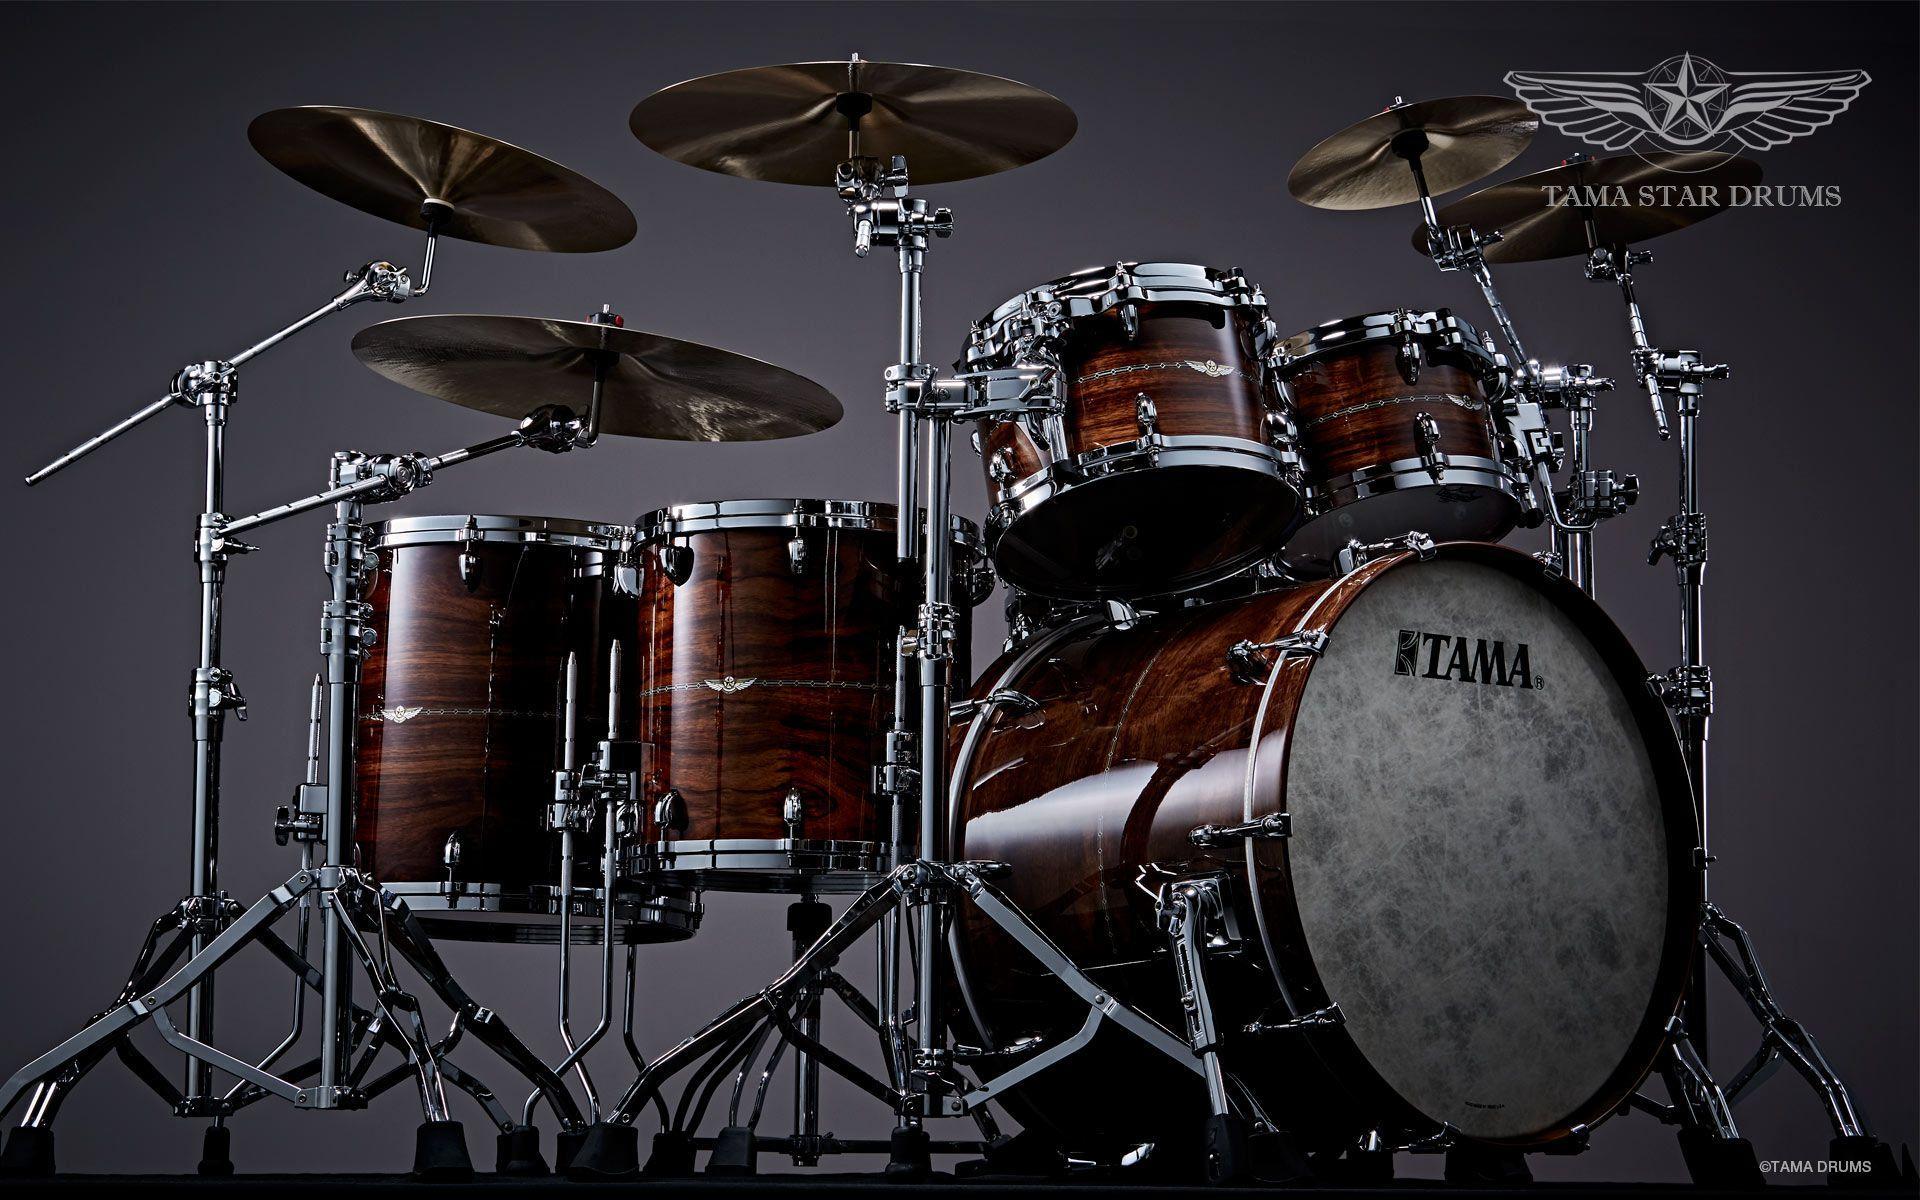 Drums Wallpapers: Drums Wallpapers Tama